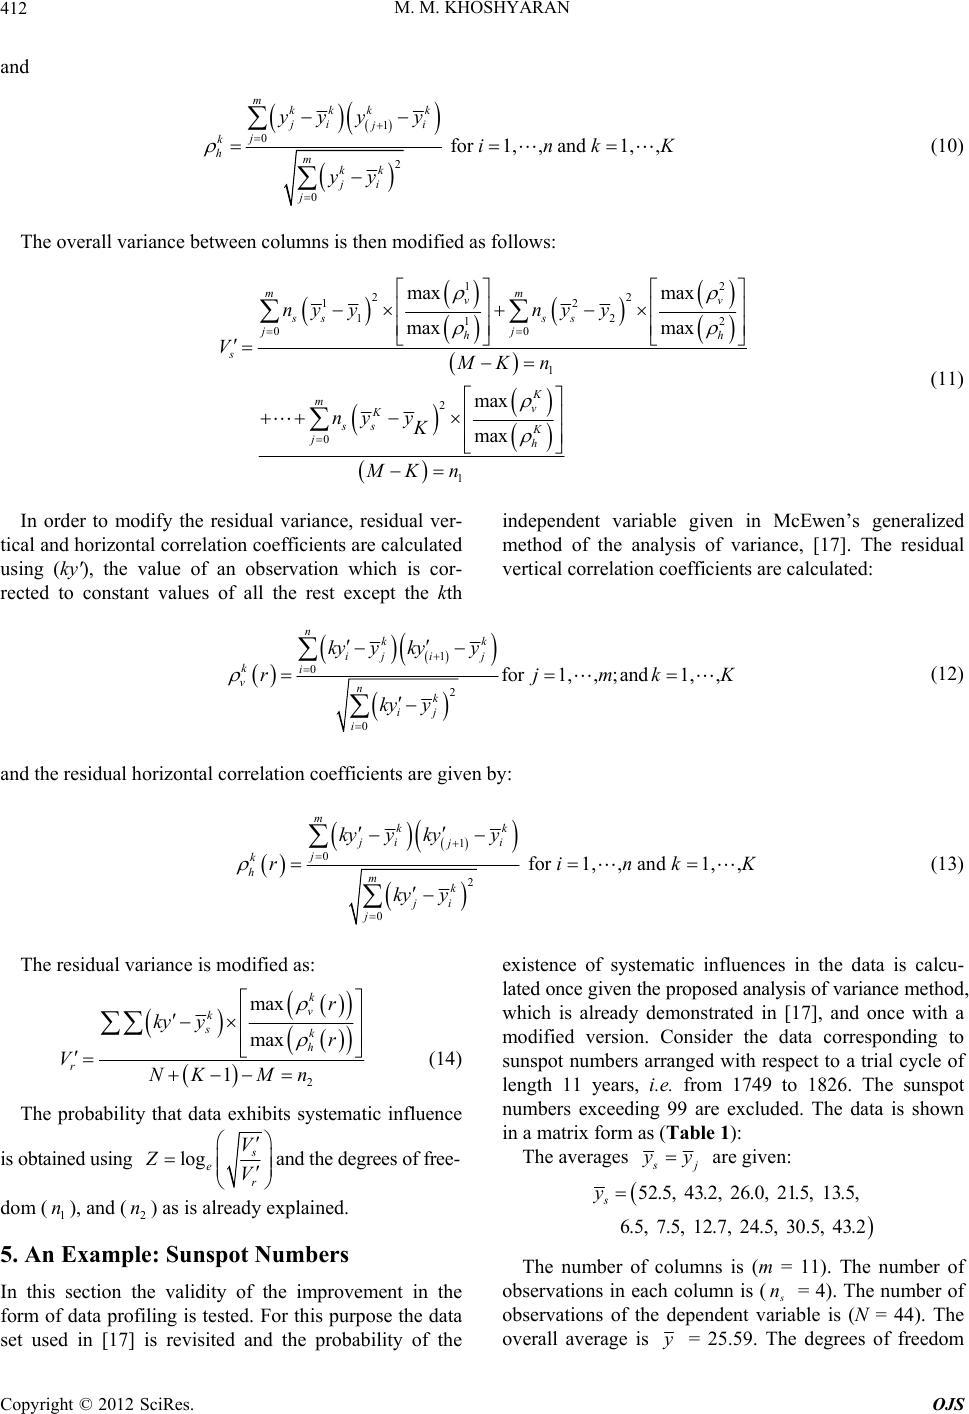 �9��^�K��kK.��.Y��_RegularitiesinSequencesofObservations